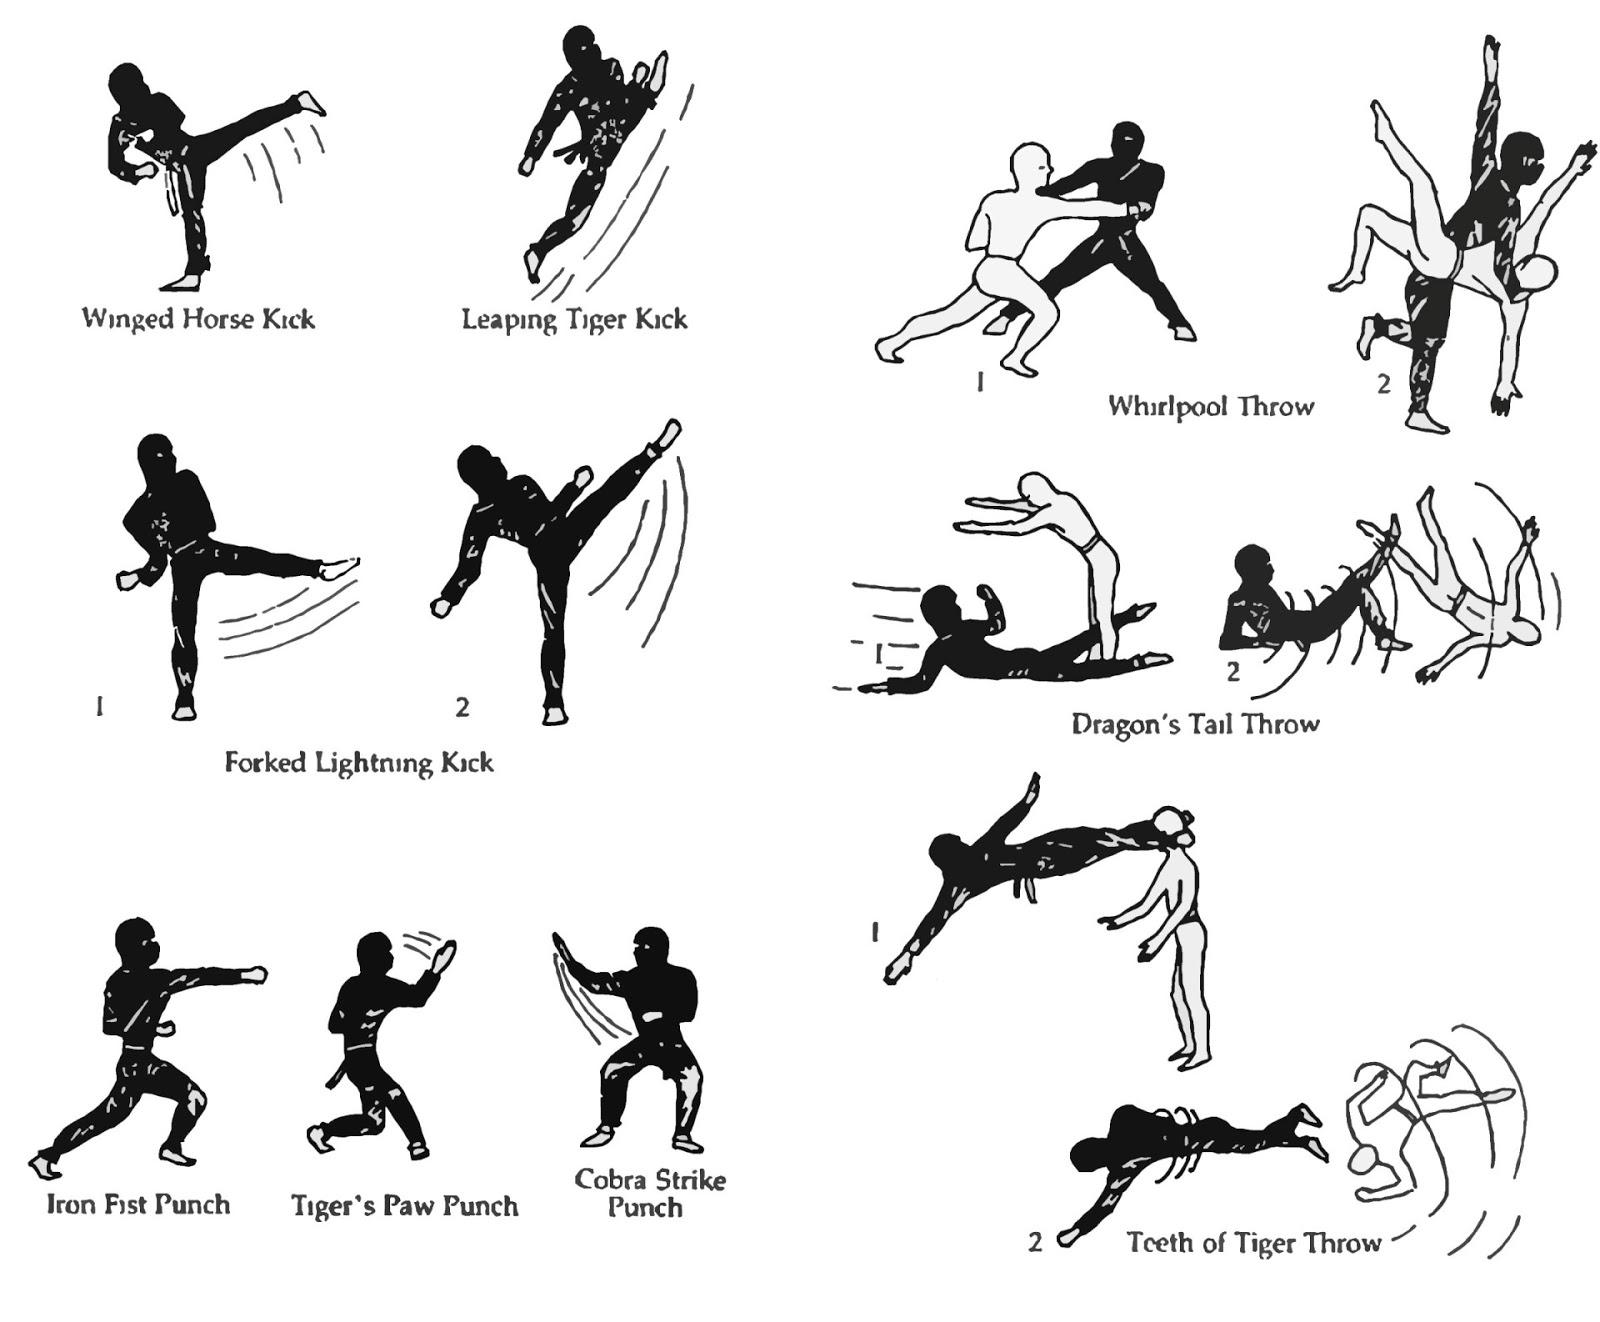 tang soo do forms diagrams 03 ford f150 wiring diagram shaolin kung fu